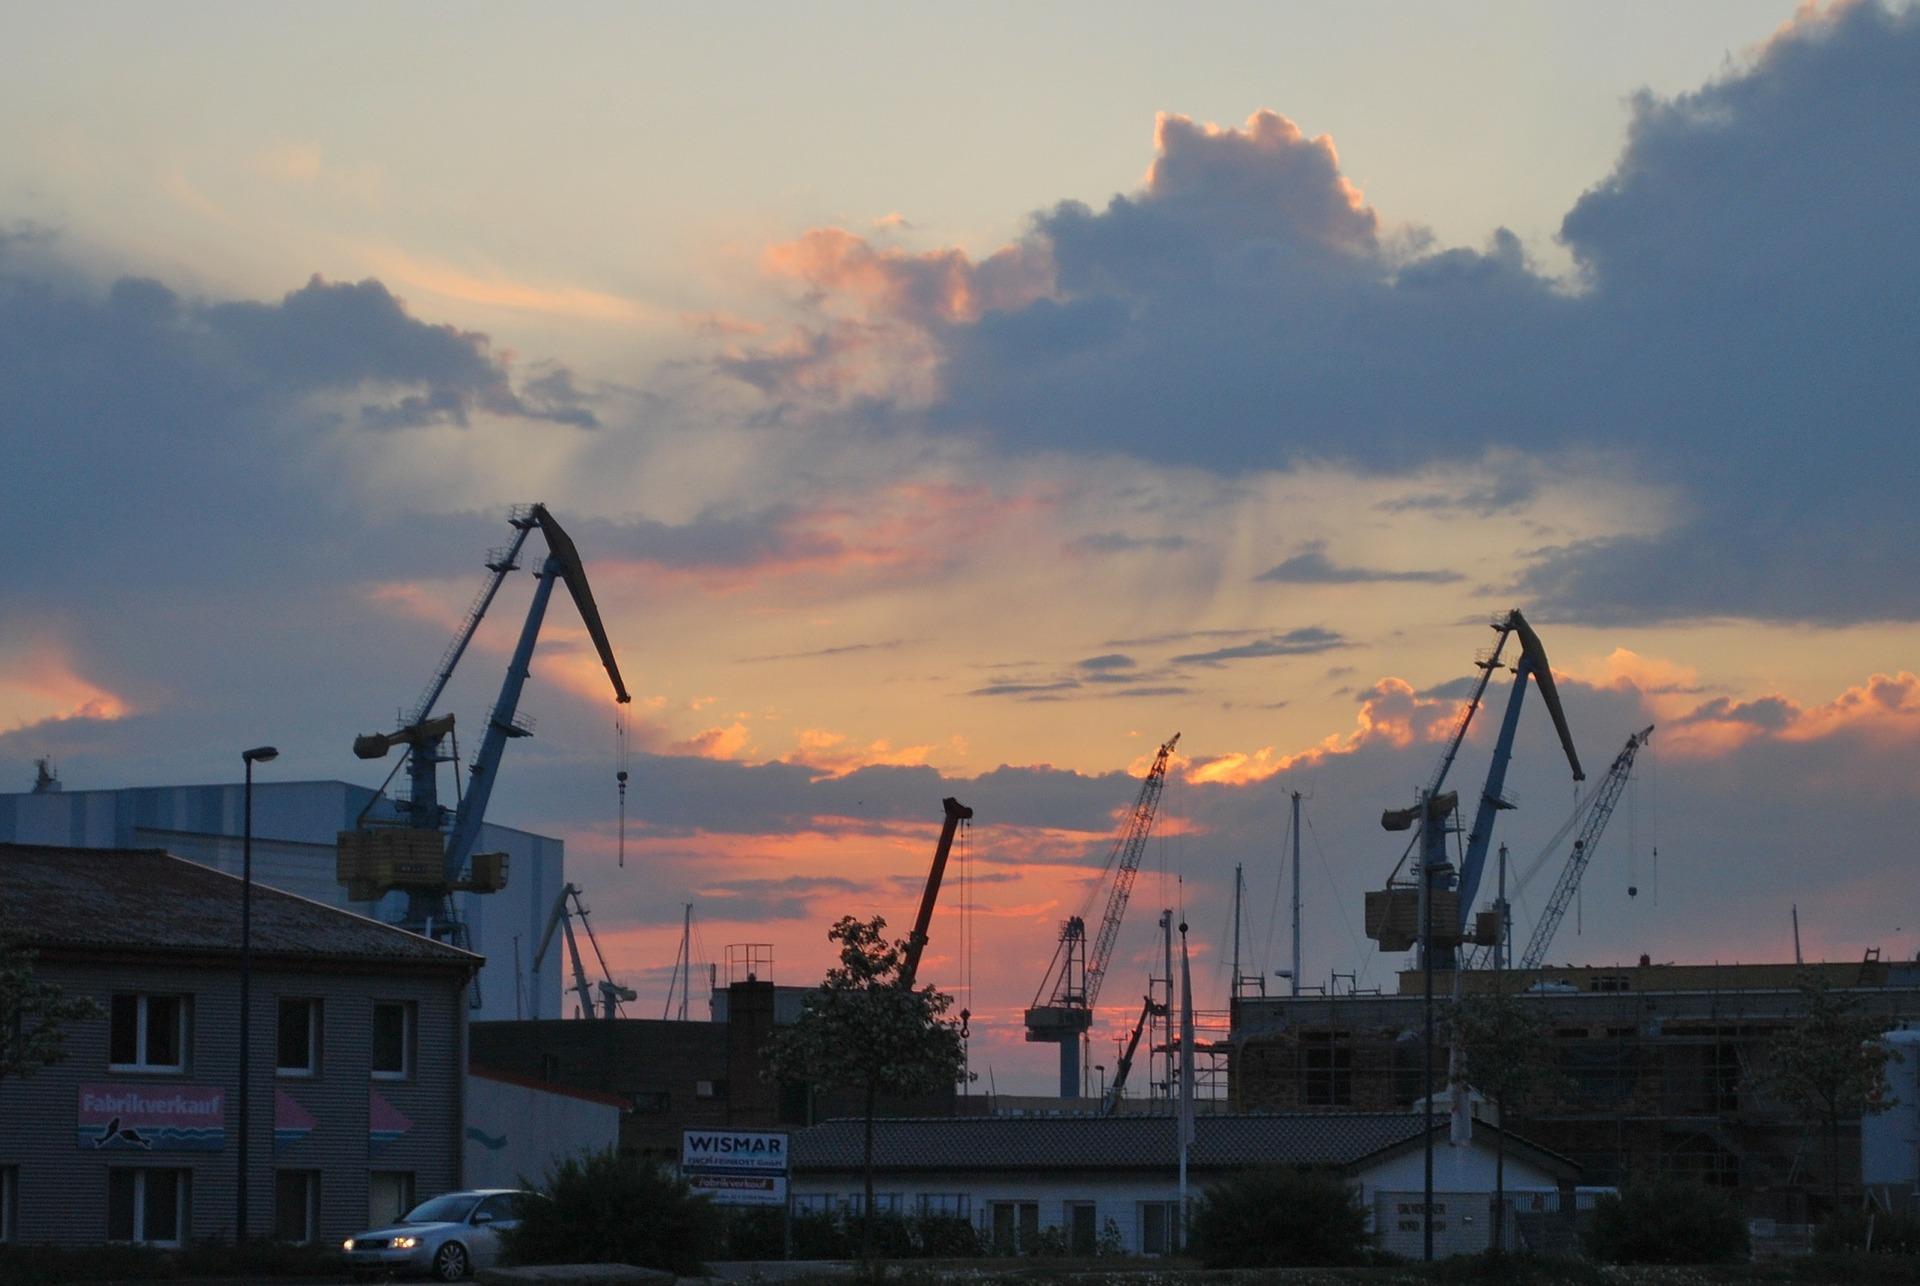 plac budowy - chmury